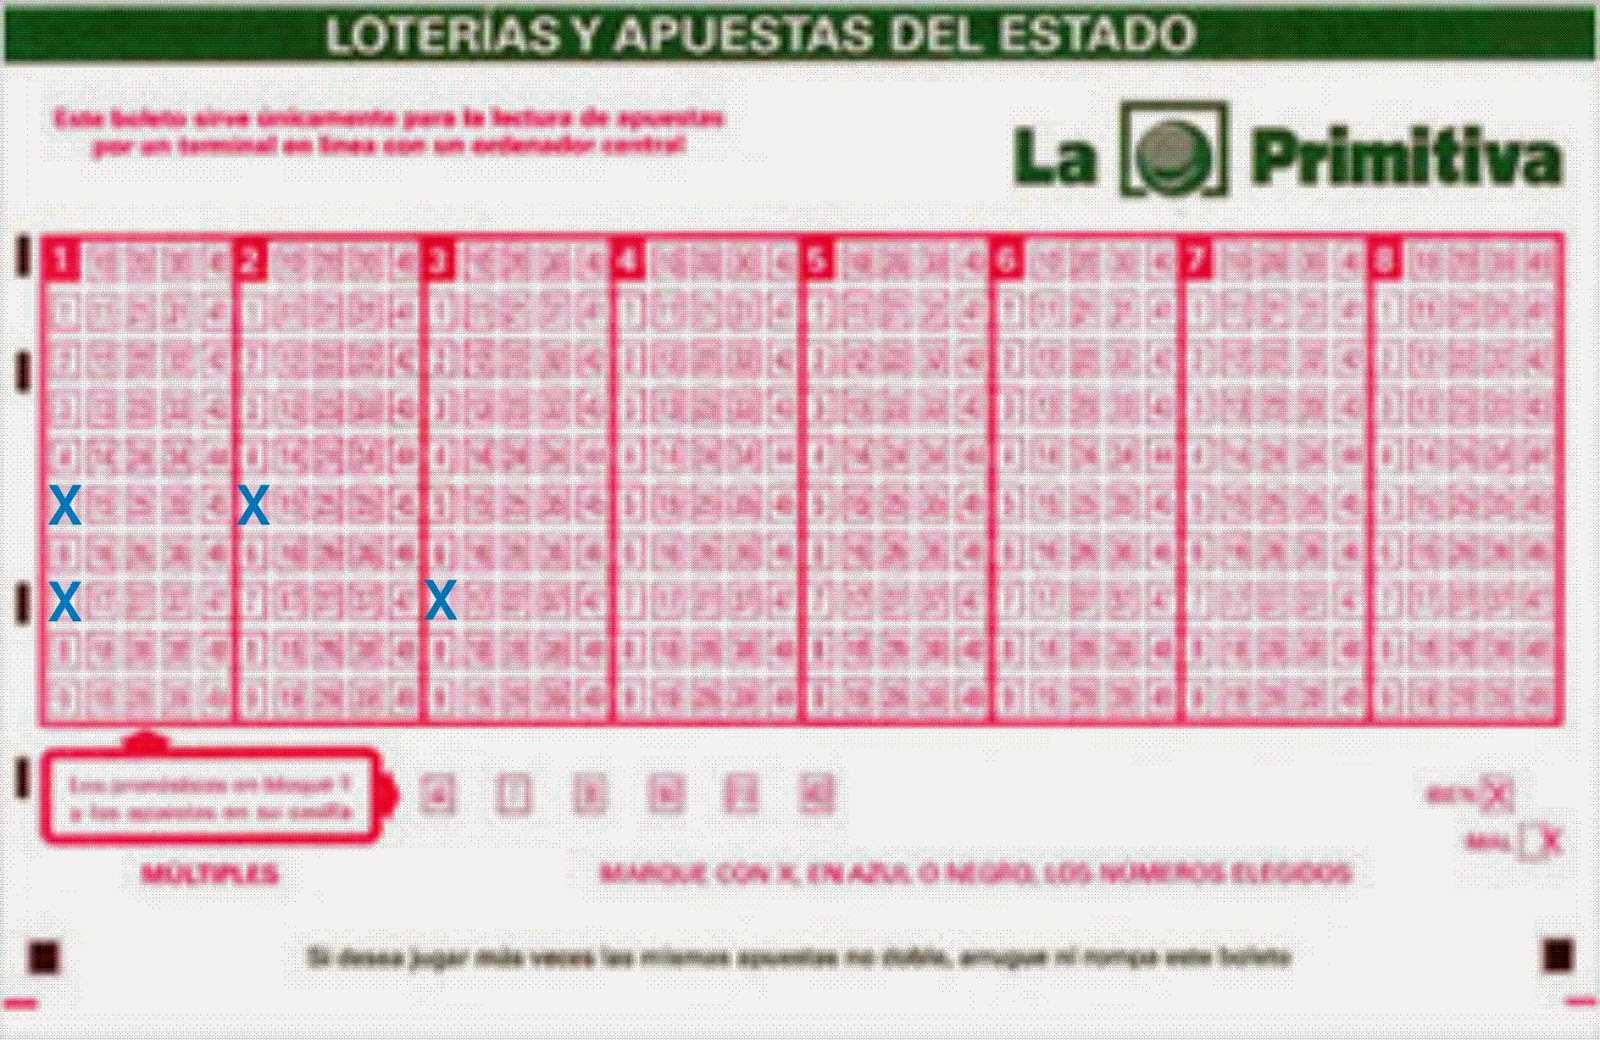 Buscar nъmero de loterнa del niсo 2020 - localiza tu dйcimo